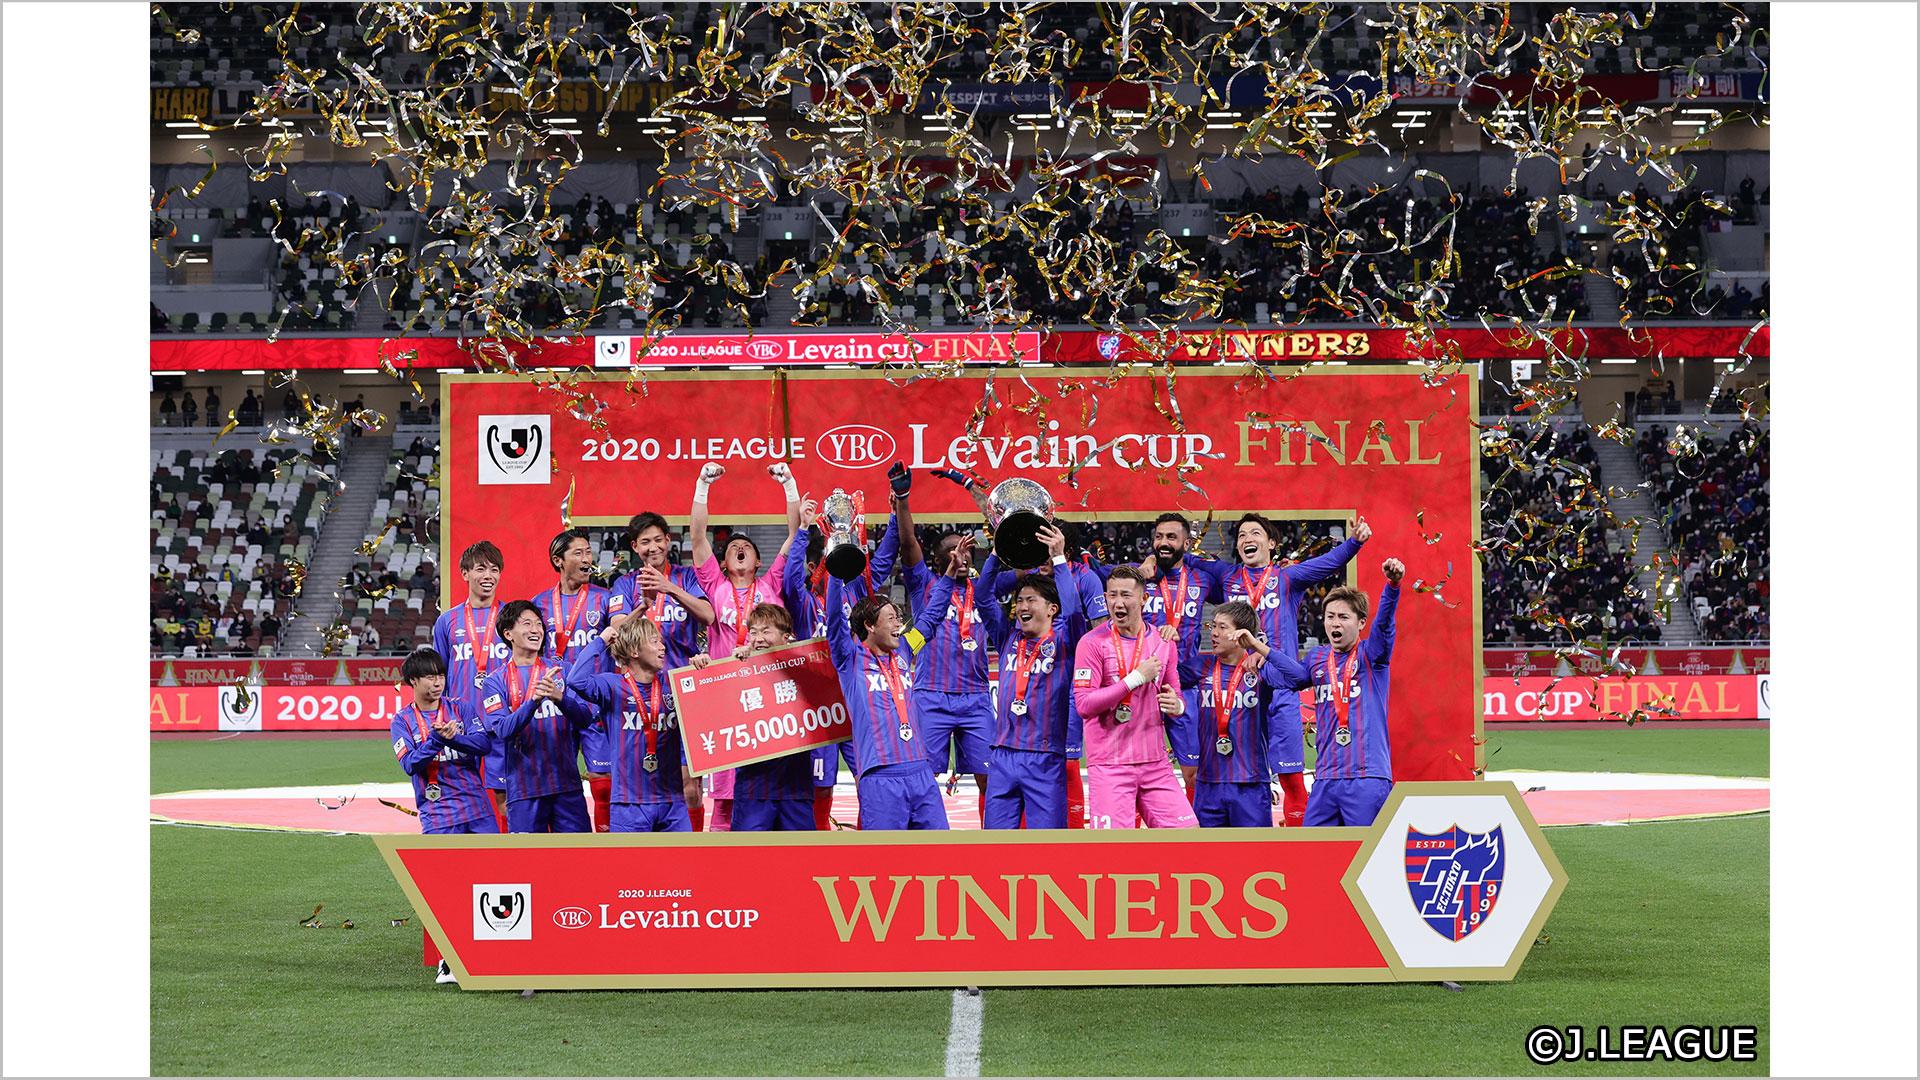 2021 JリーグYBCルヴァンカップ グループステージ 第5節 Cグループ 横浜FC vs 湘南ベルマーレ